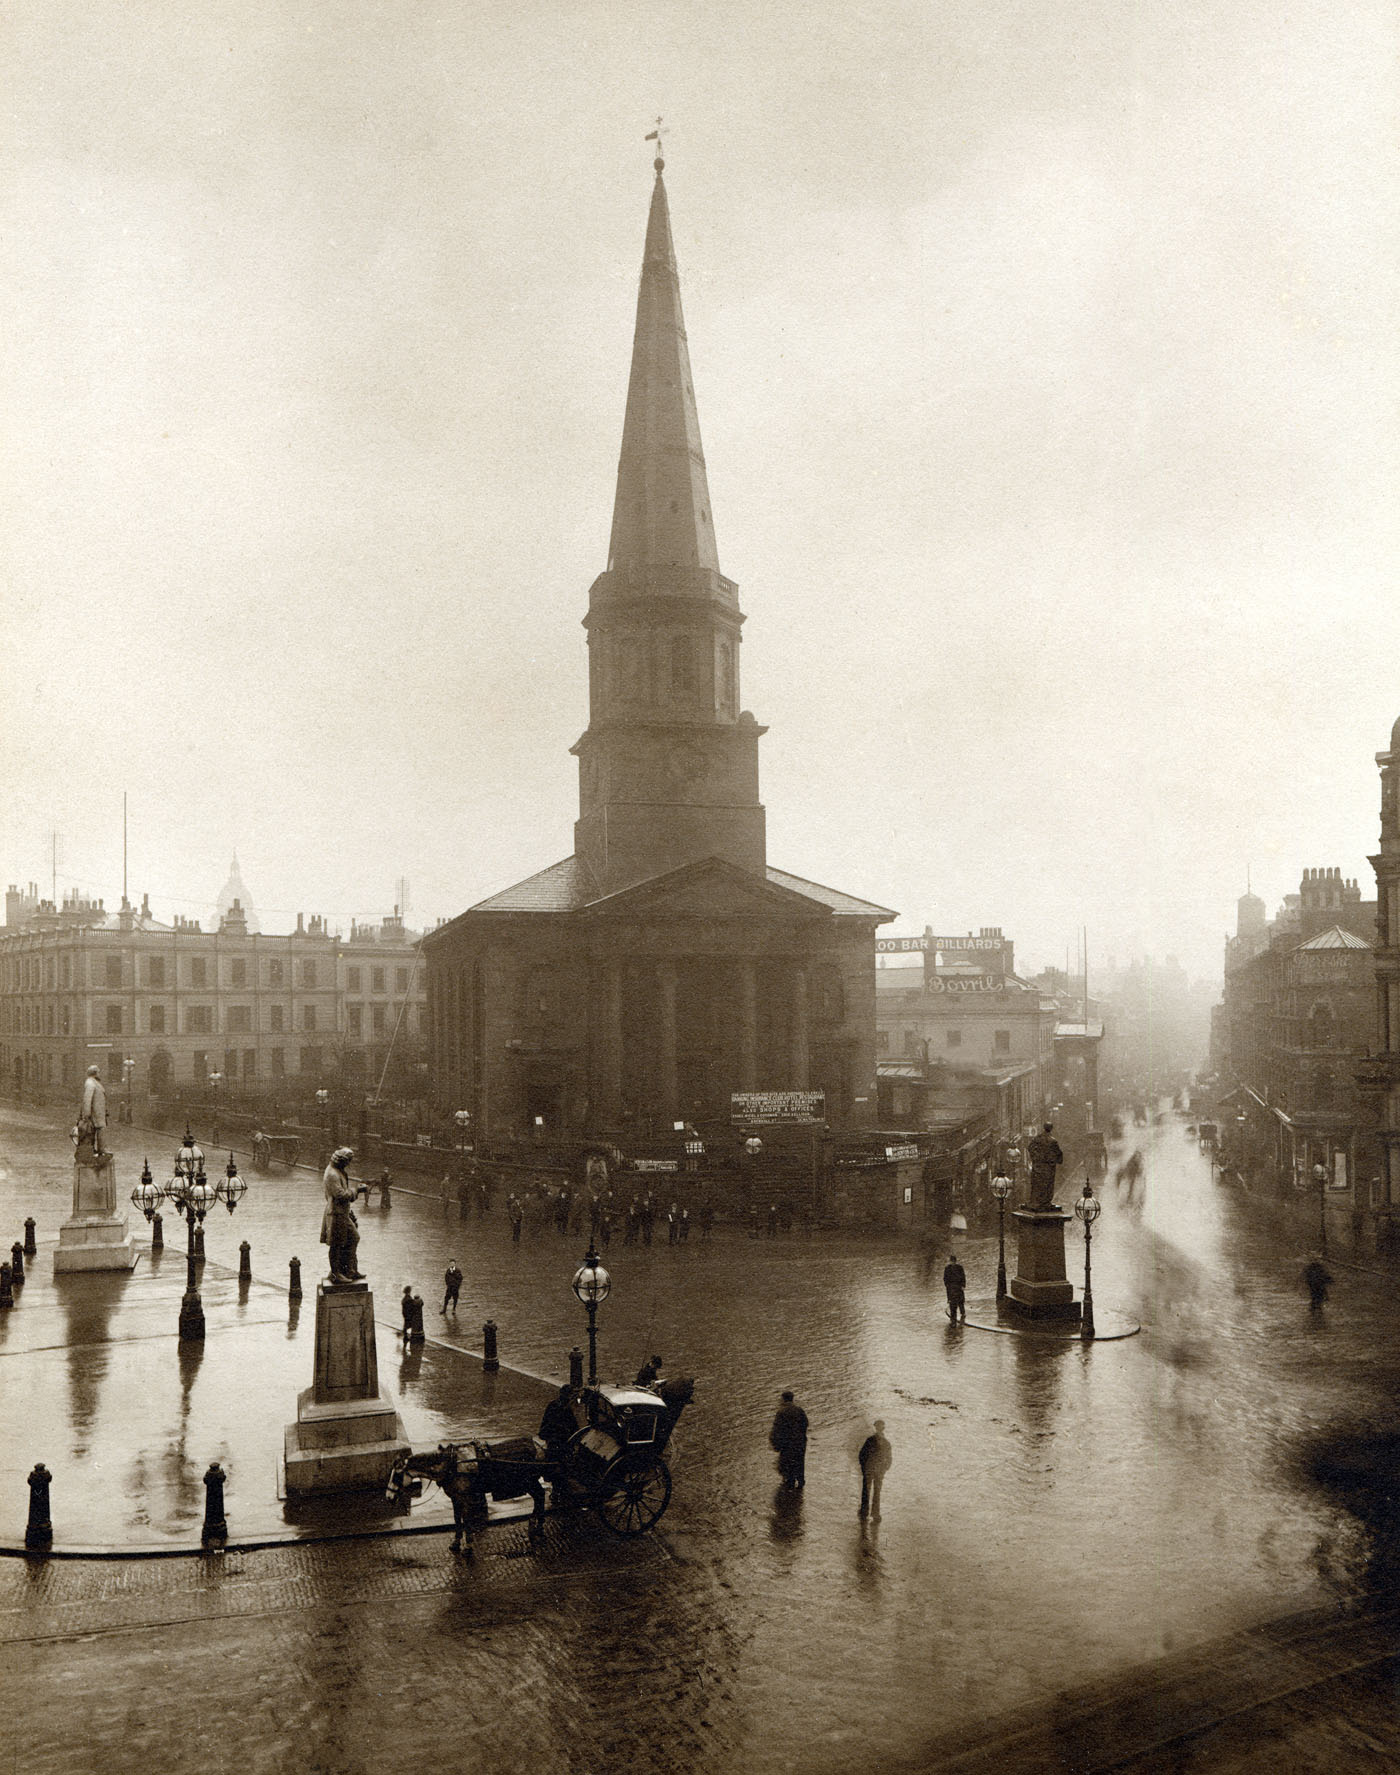 A wet day in Birmingham